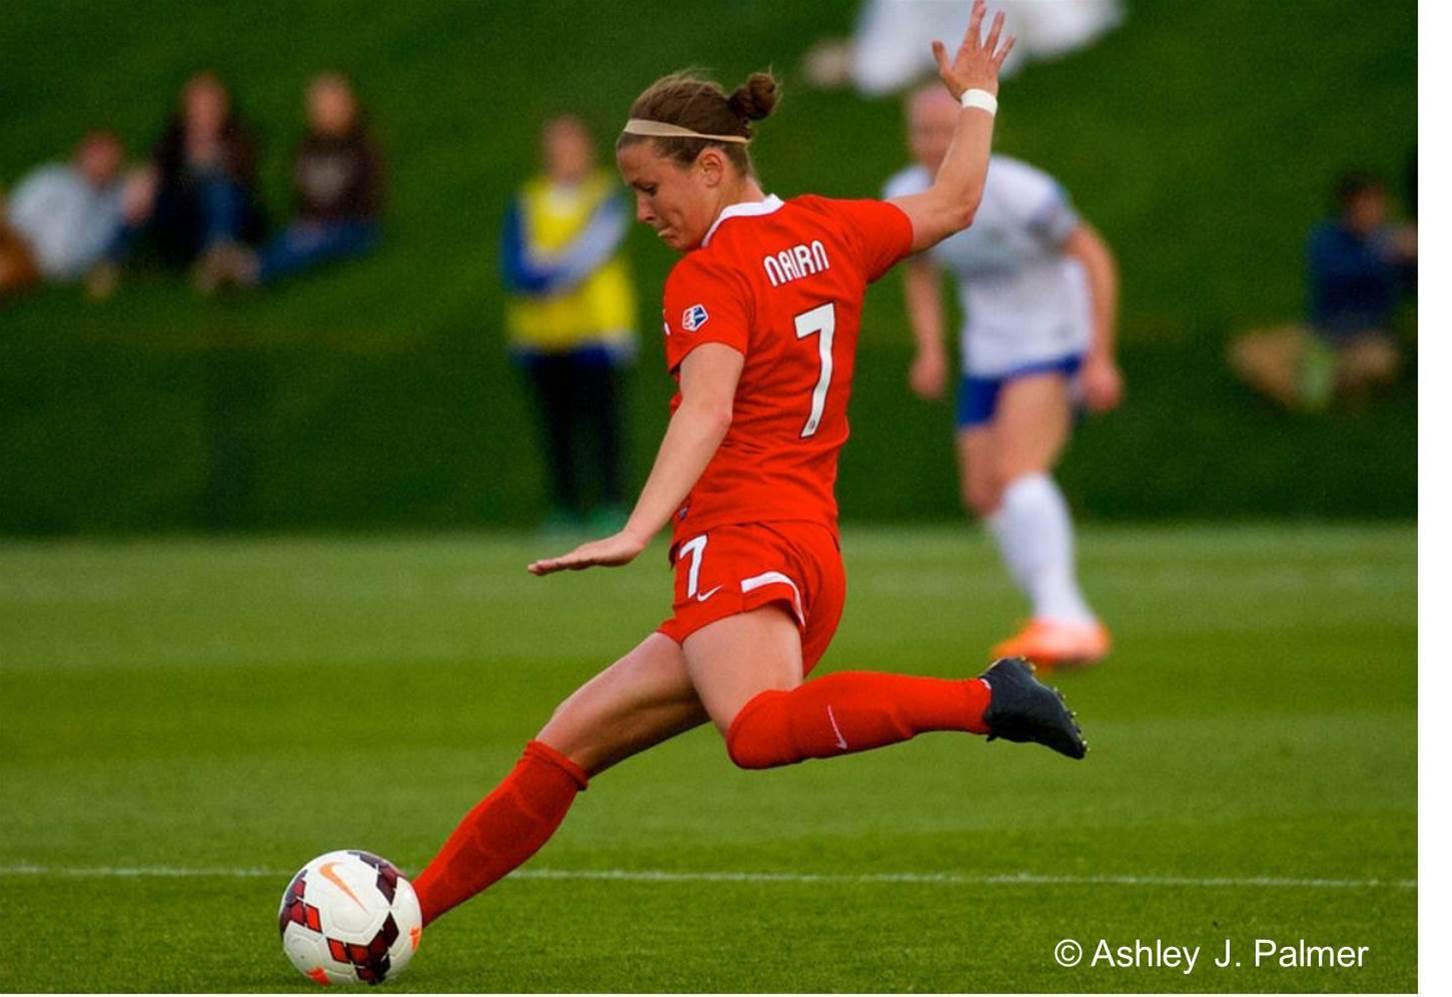 Midfielder Christine Nairn Melbourne Victory's final international